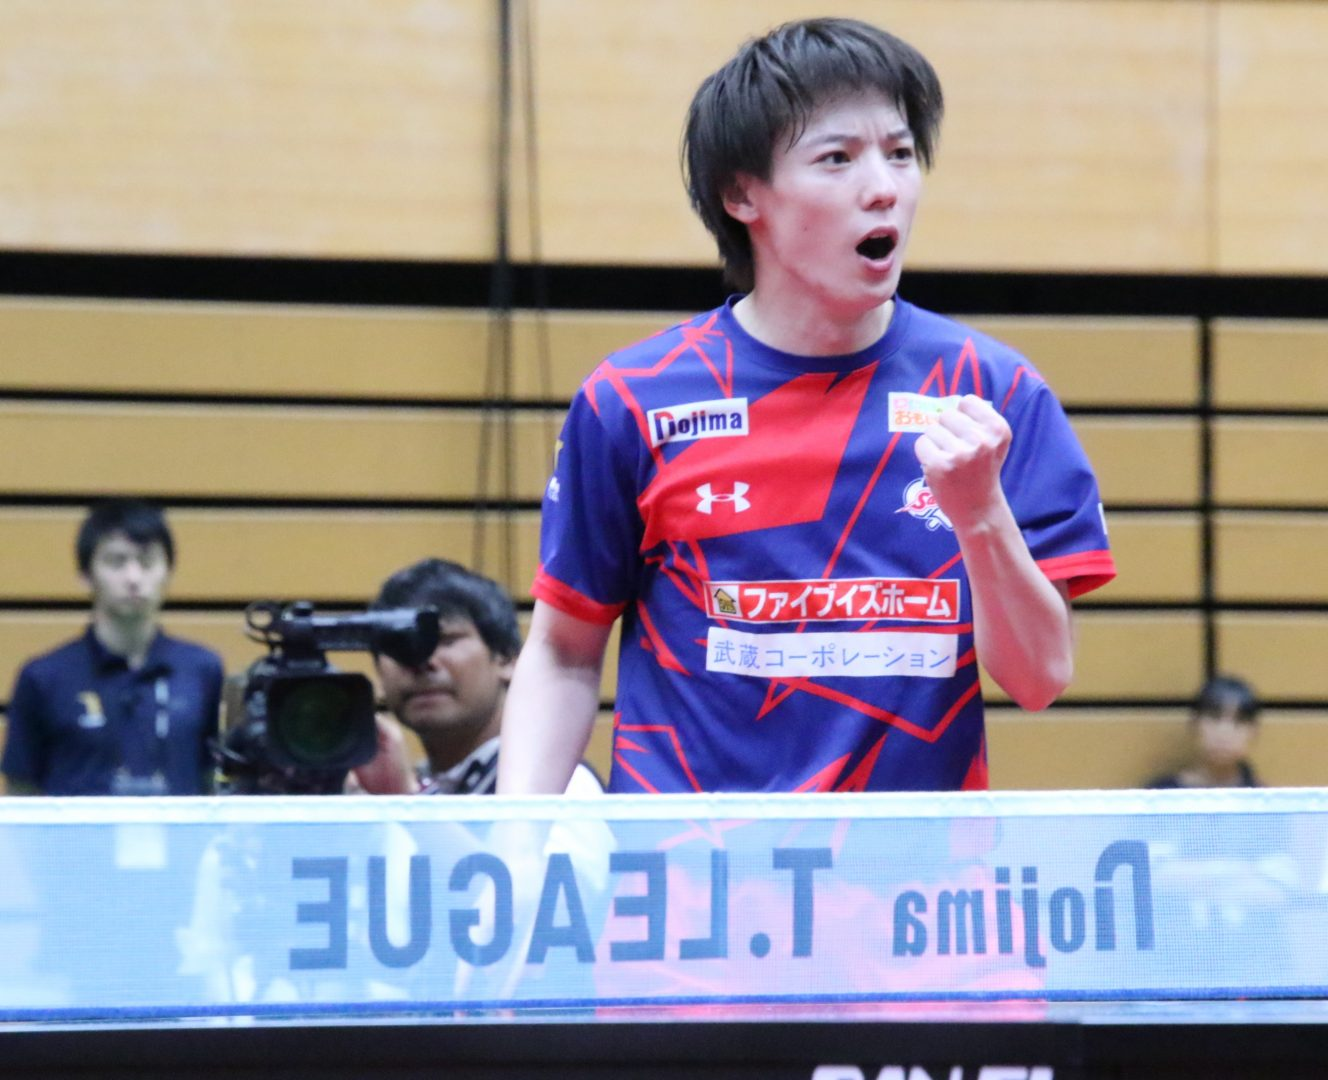 T.T彩たま、初の首位浮上 ホームで2連勝<卓球・Tリーグ結果速報>